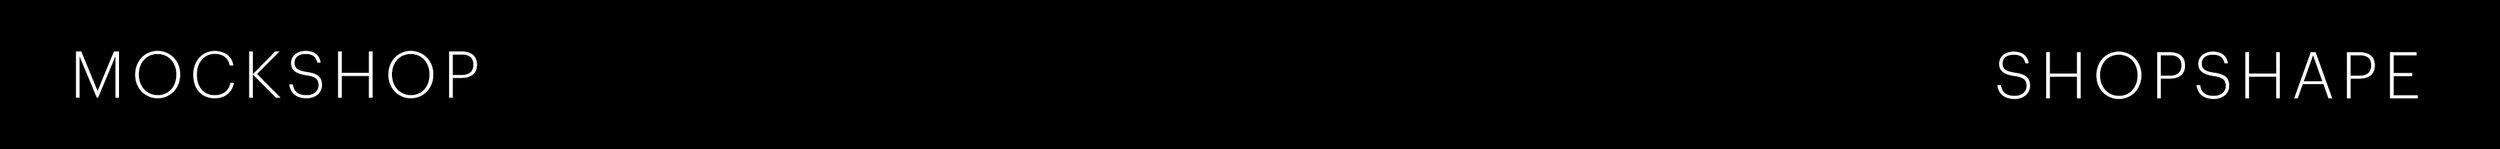 MOCKSHOP-HEADER.jpg